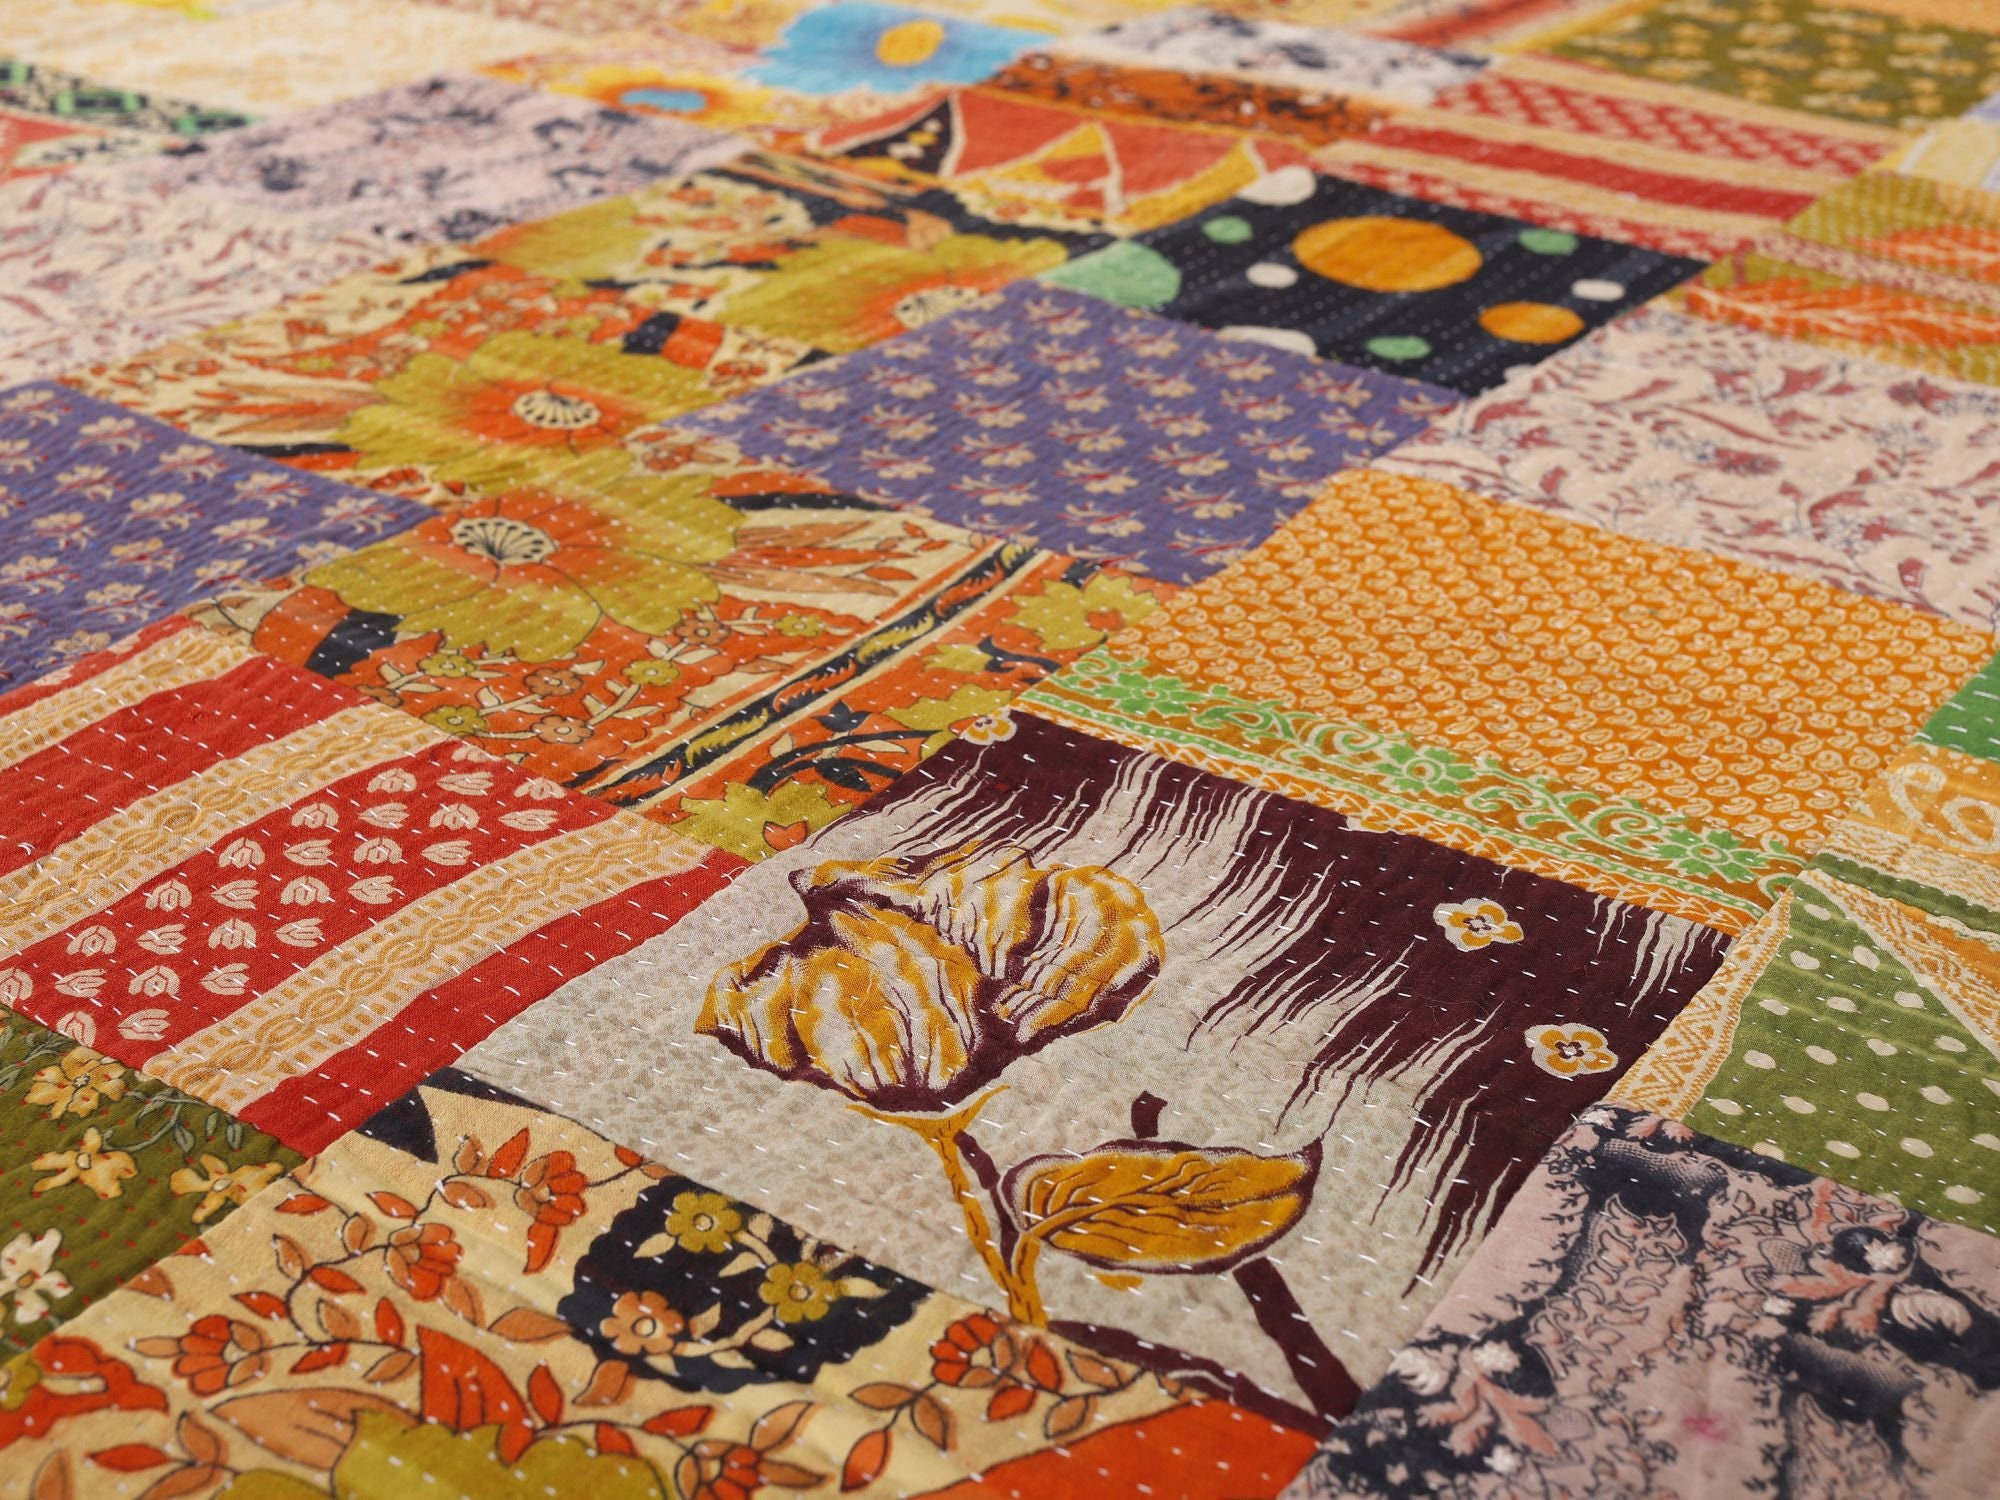 Vintage Kantha Patchwork Quilt Blanket Throw Queen Bedding Bedspread Made With Vintage Cotton Indian Saree Vintage Kantha Patchwork Patchwork